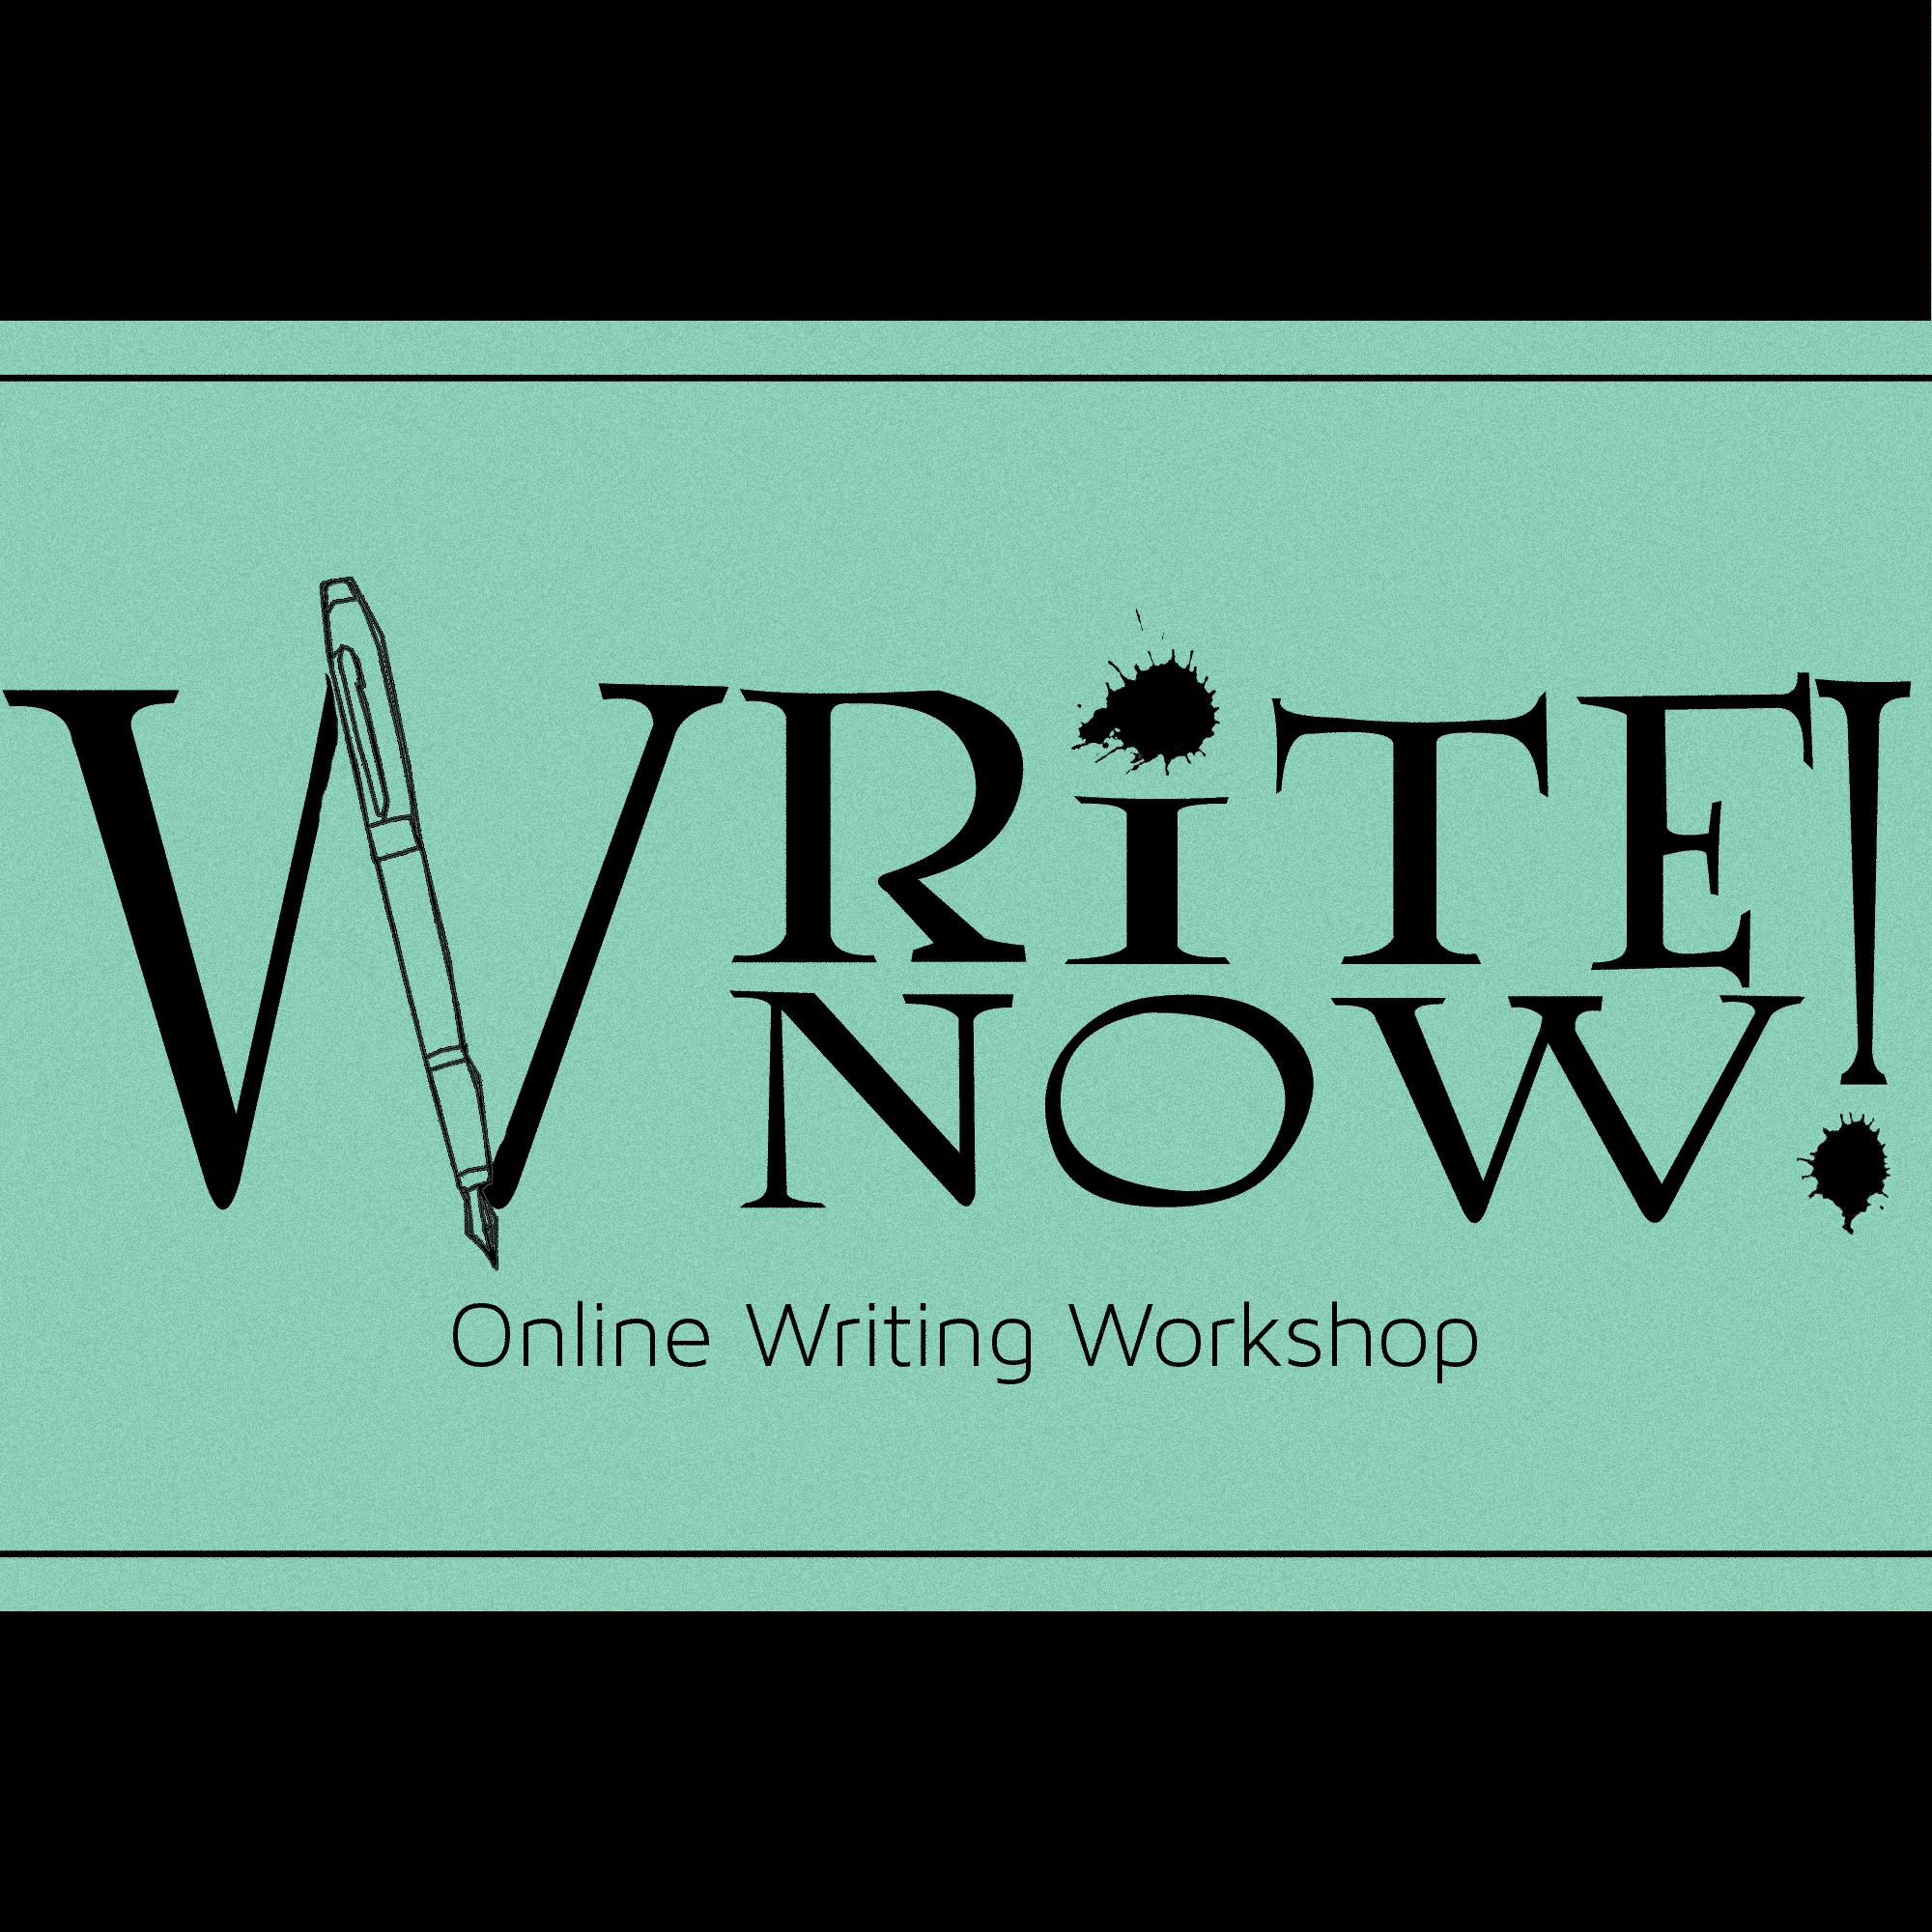 online writing workshop; injoyinc.com